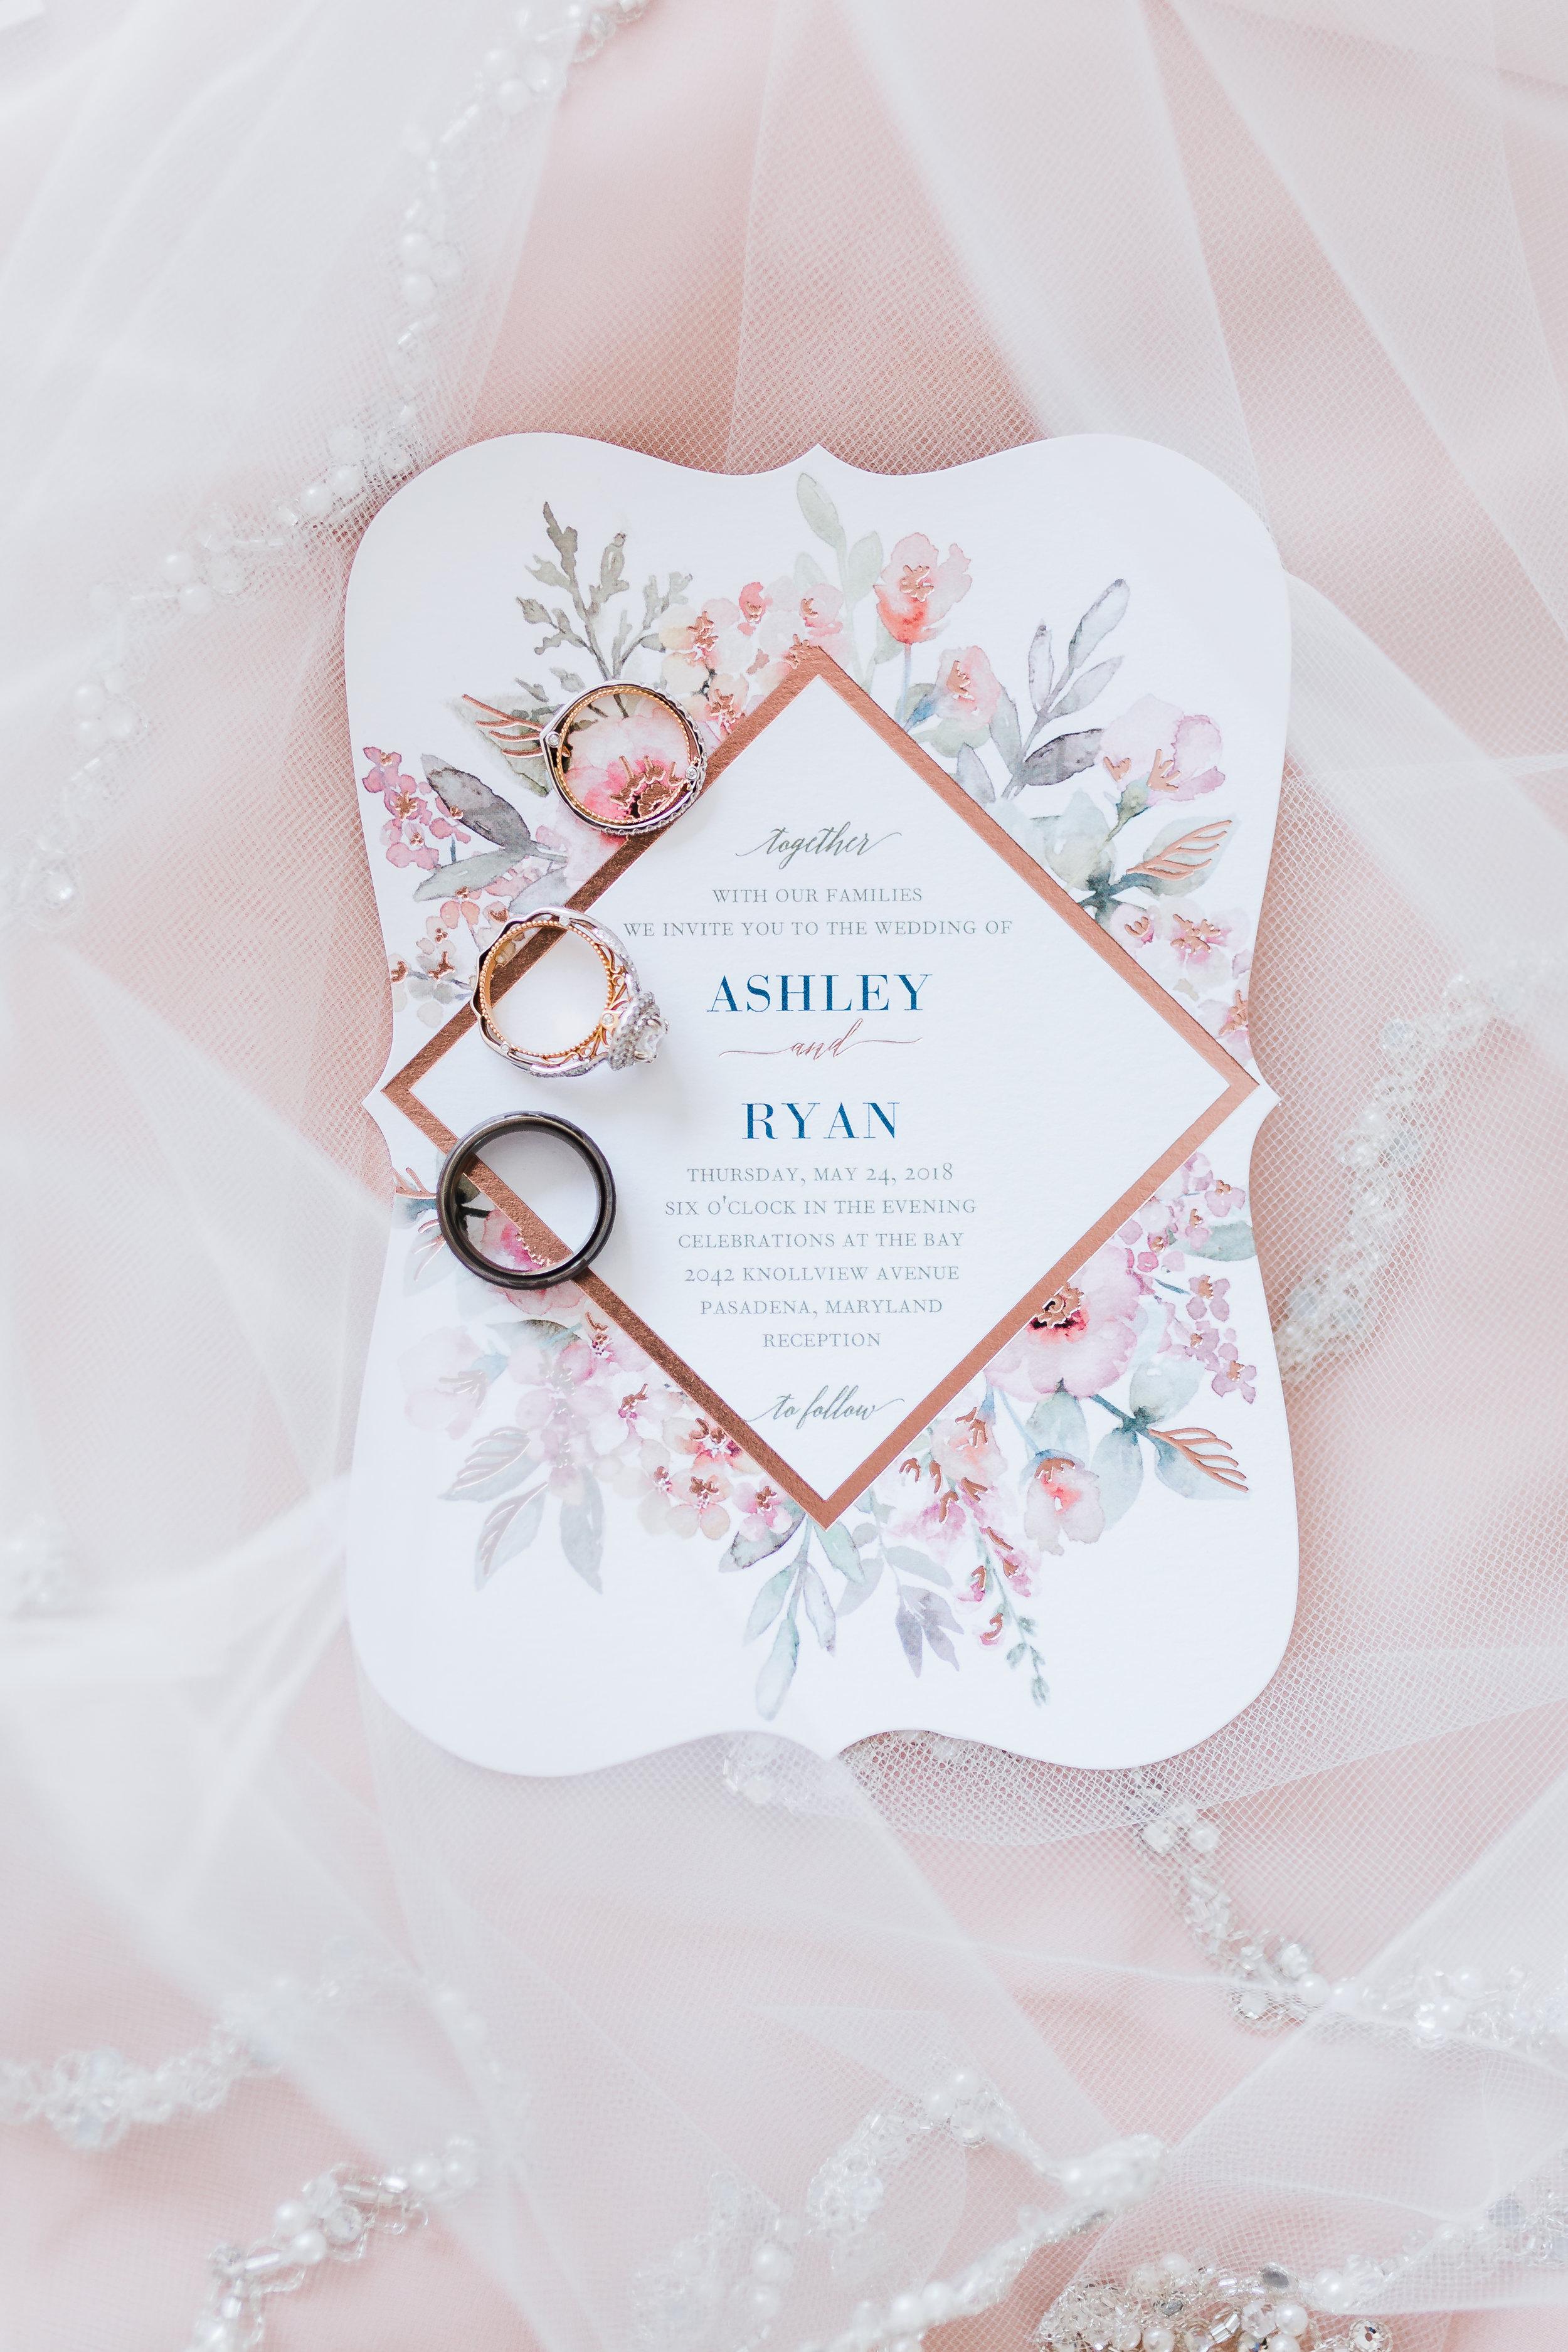 wedding invitation and rings for pasadena md wedding